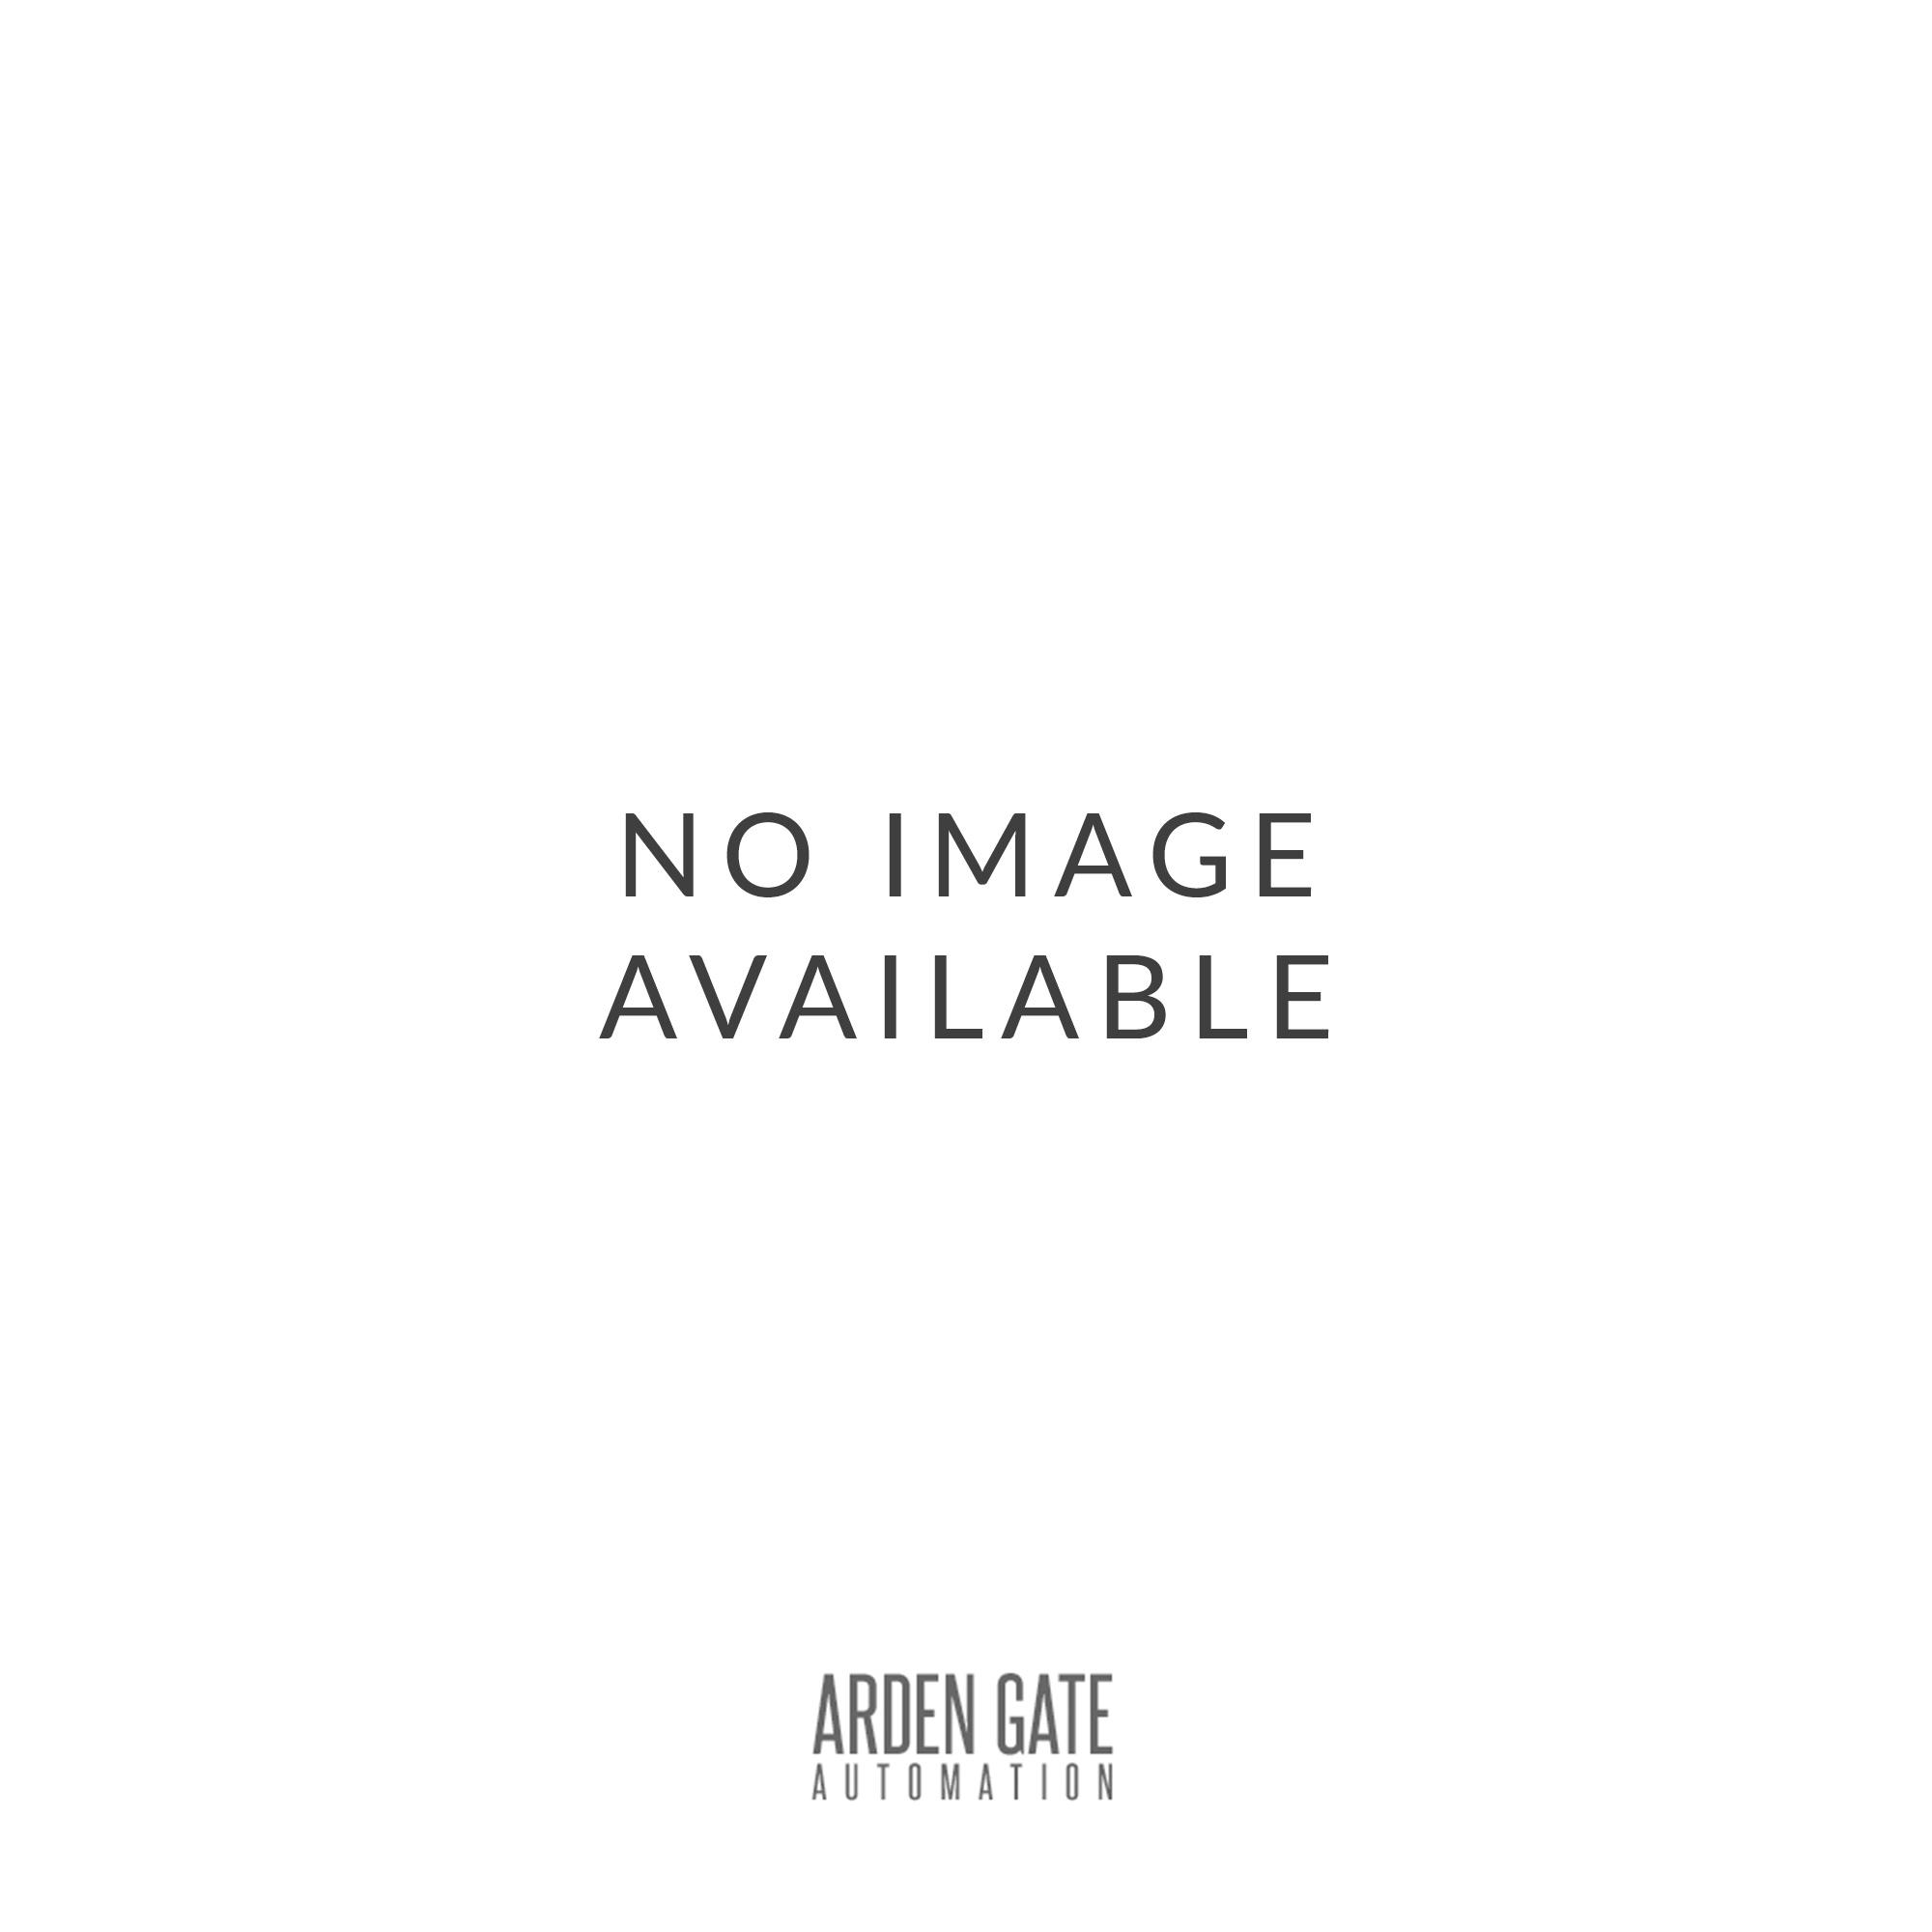 Perseo CBD control panel